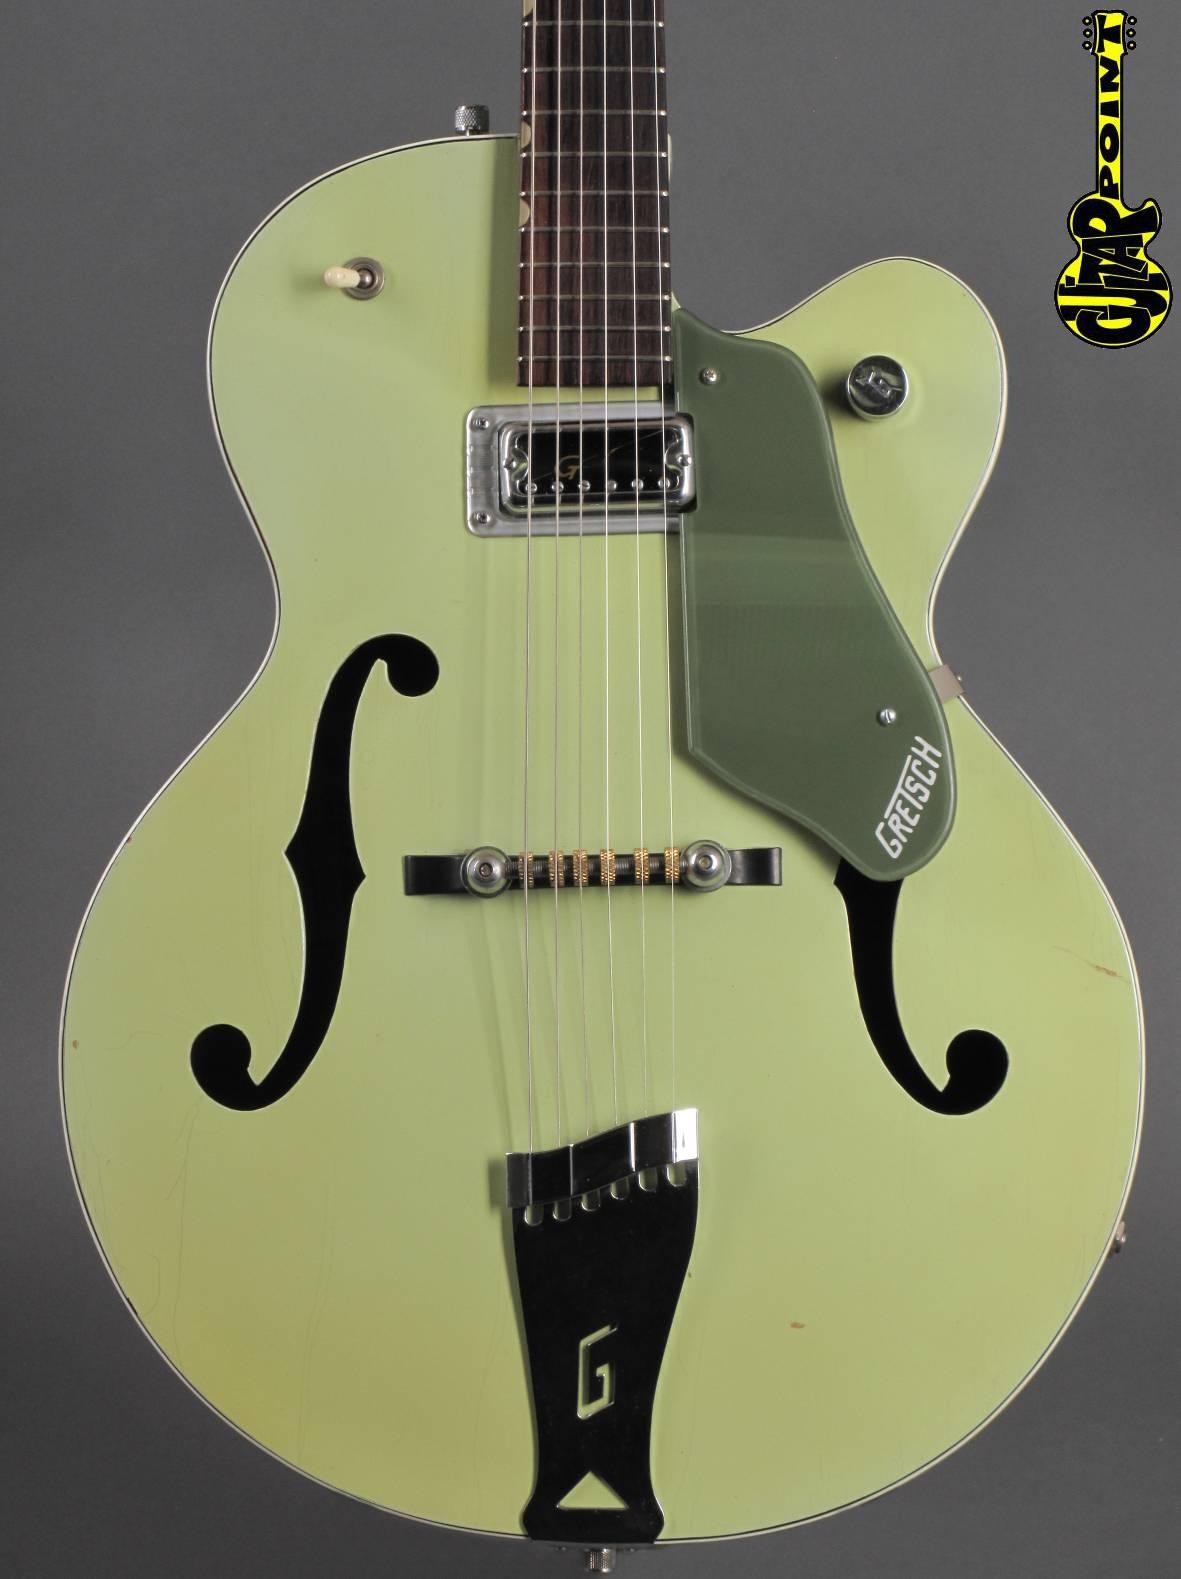 1962 Gretsch 6125 Anniversary - 2-tone Smoke Green